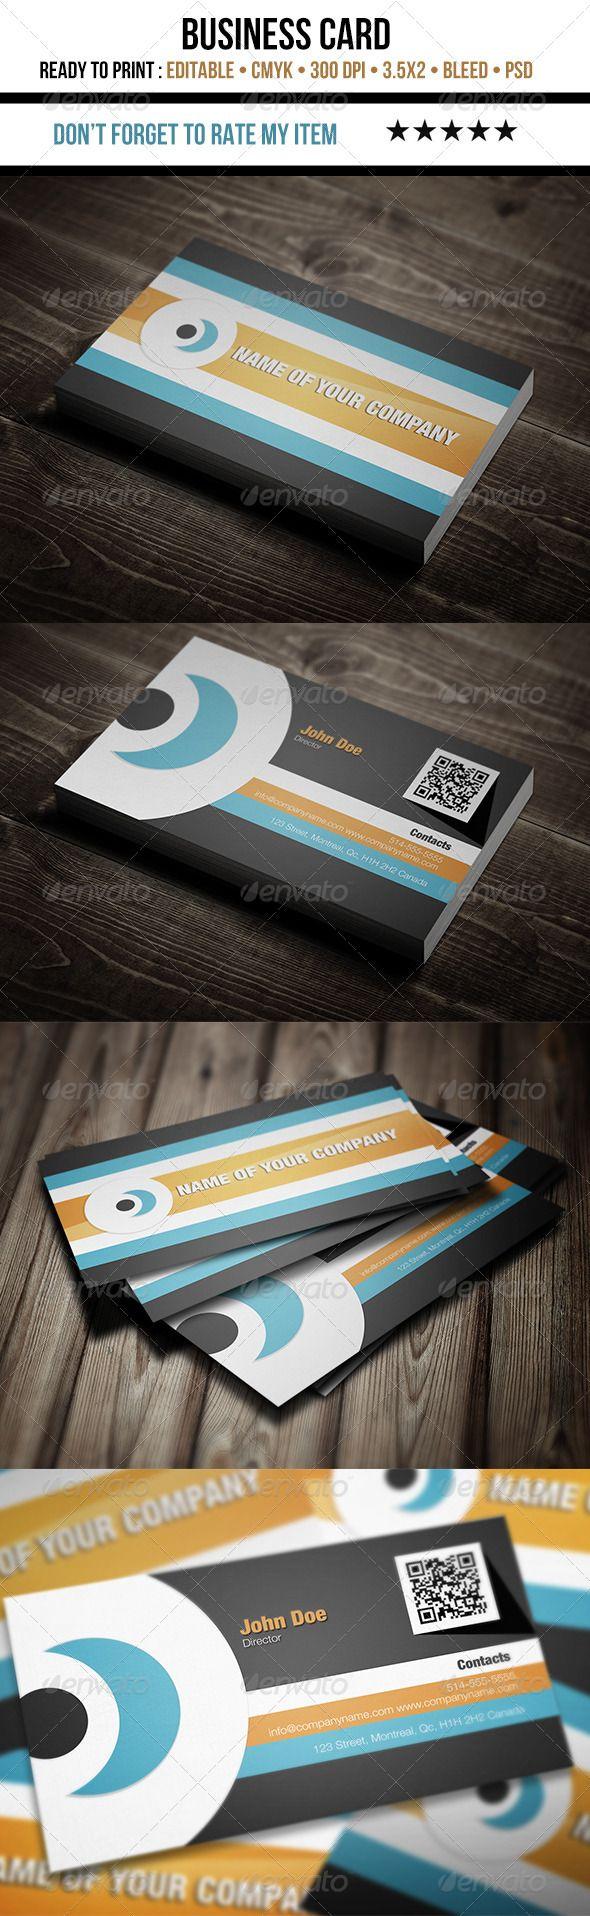 97 best print templates images on pinterest fonts business corporate flat design business card magicingreecefo Images